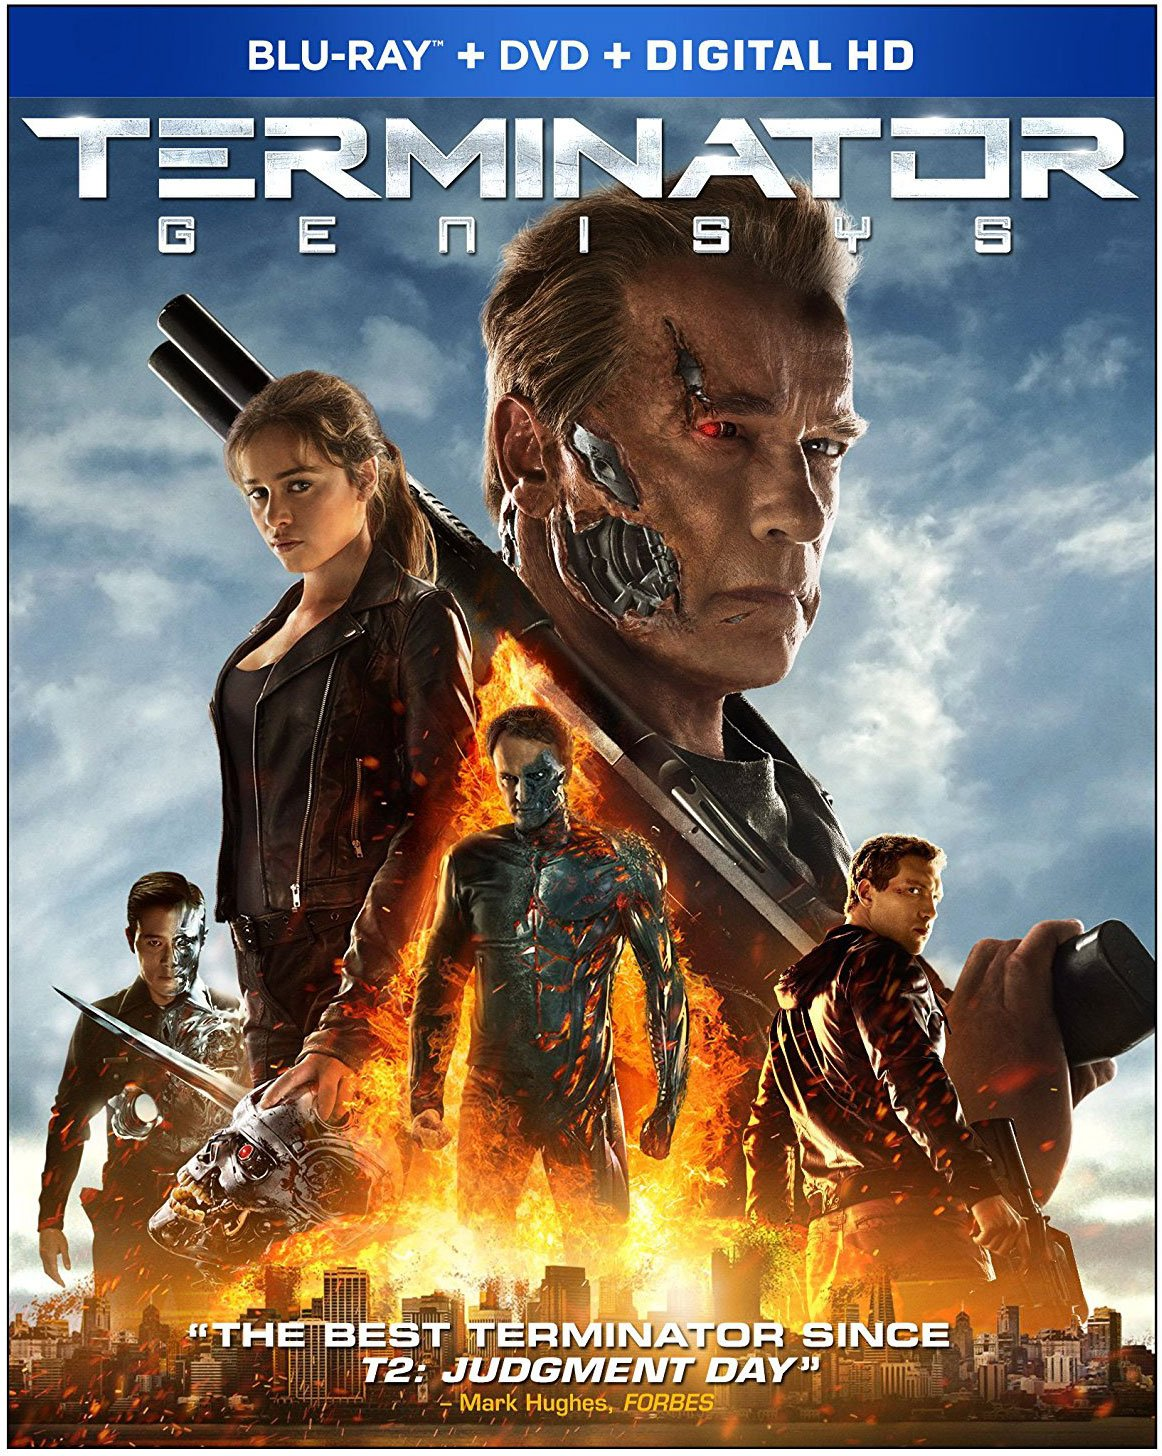 Terminator Genisys Dolby Atmos Blu-ray